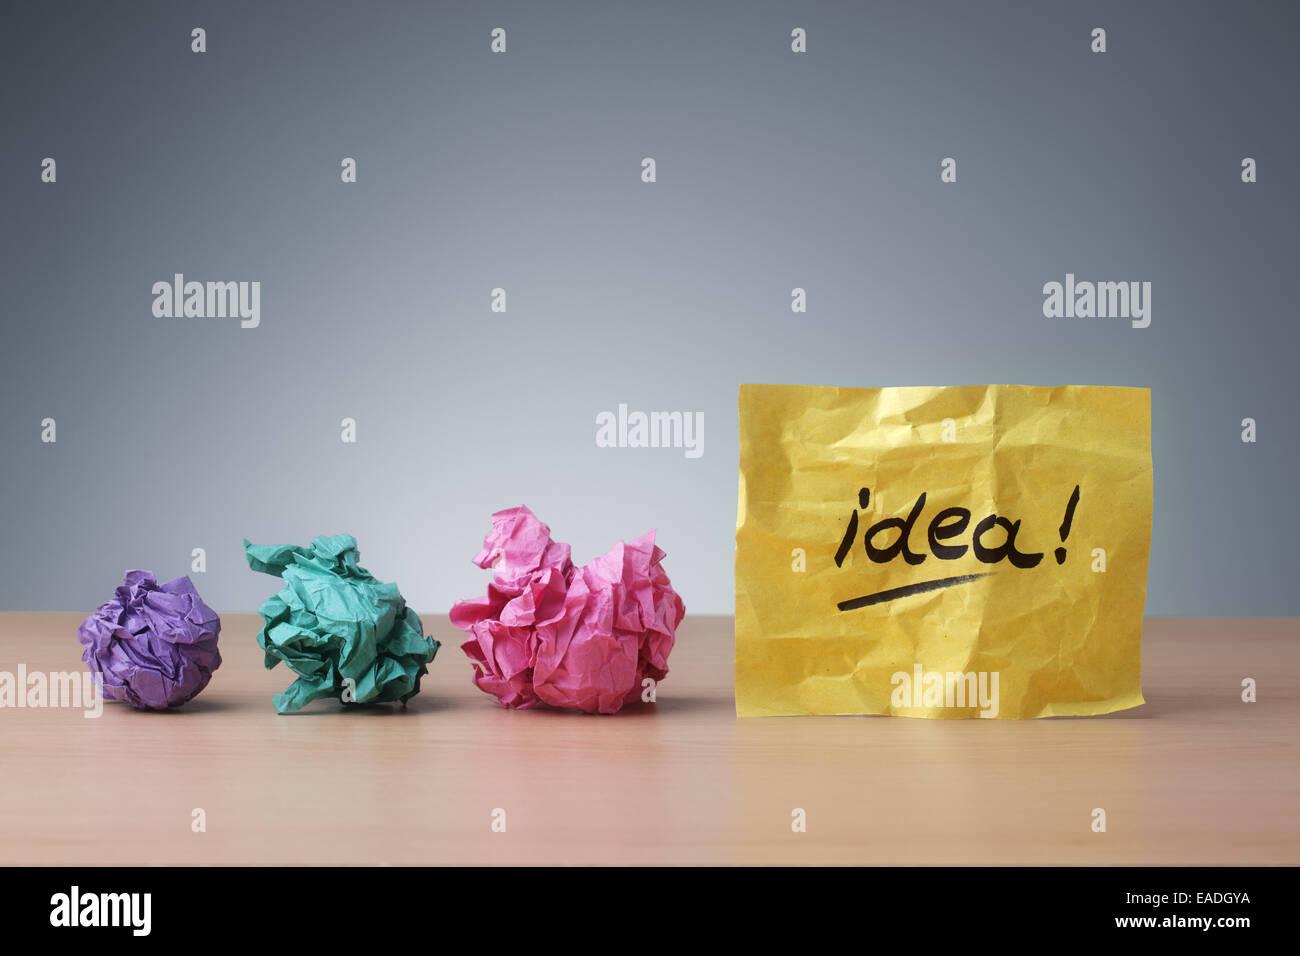 Idée qui évolue Photo Stock